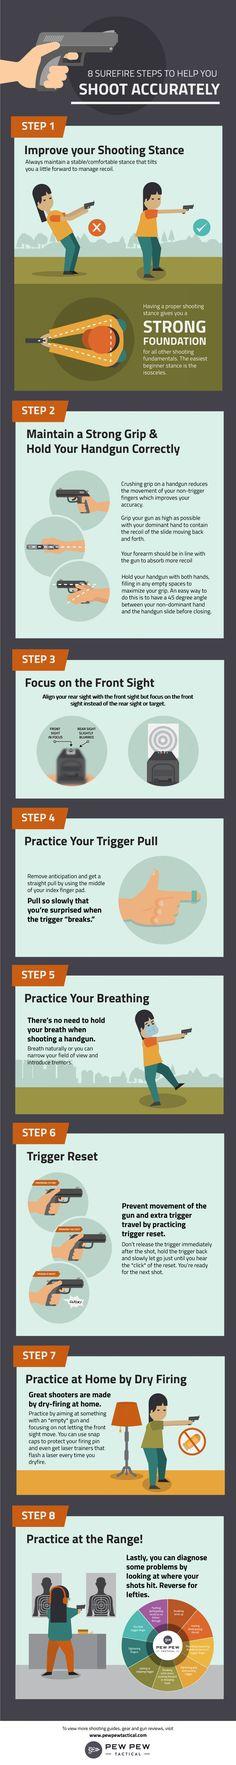 Infographic: 8 Ways to Improve Your Handgun Accuracy